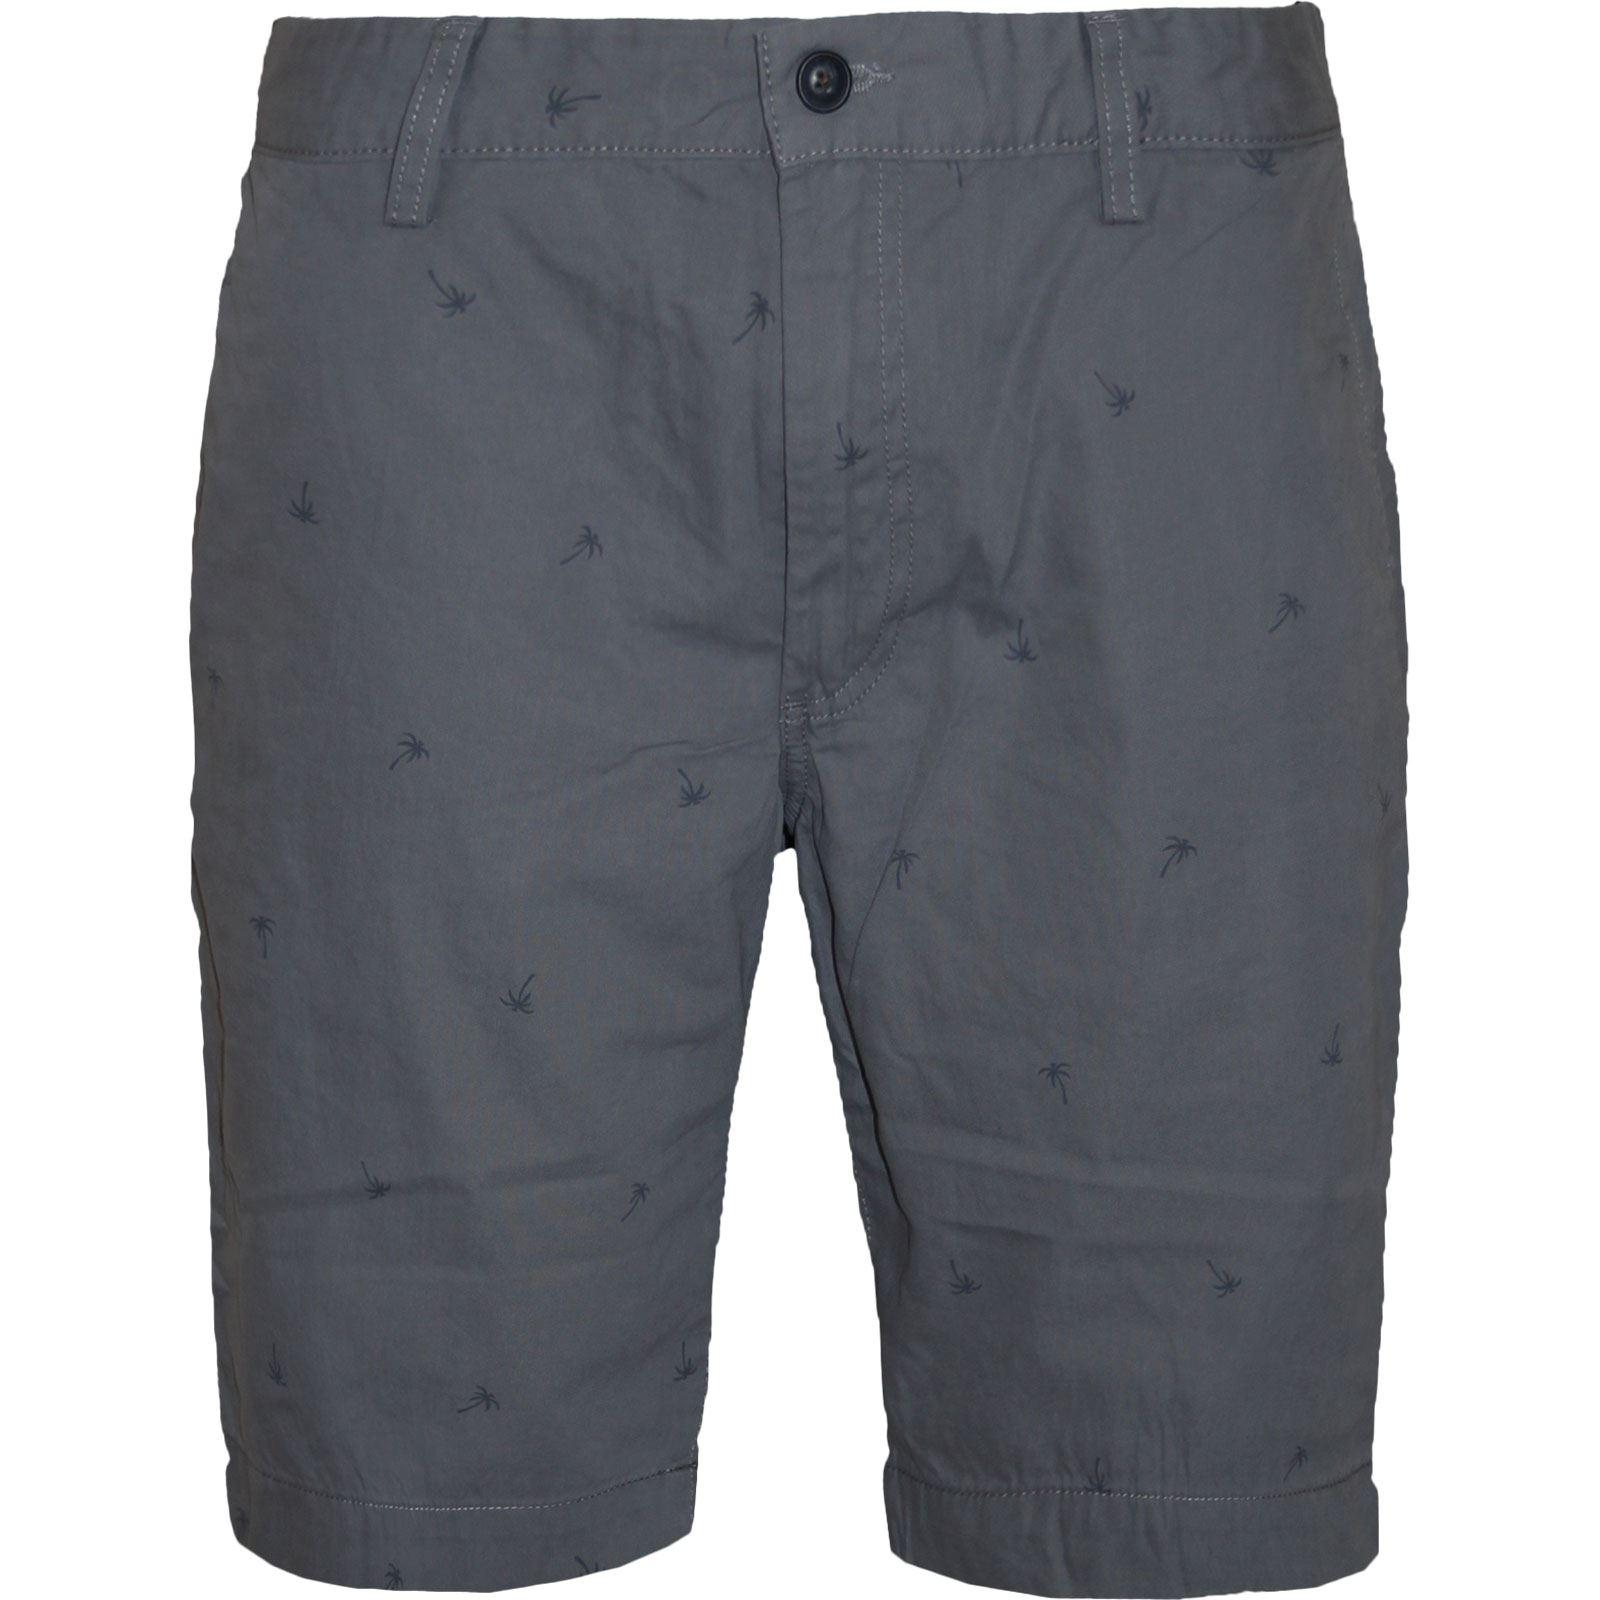 nouveau homme zara homme short chino cargo combat bermuda pantalon floral imprim ebay. Black Bedroom Furniture Sets. Home Design Ideas